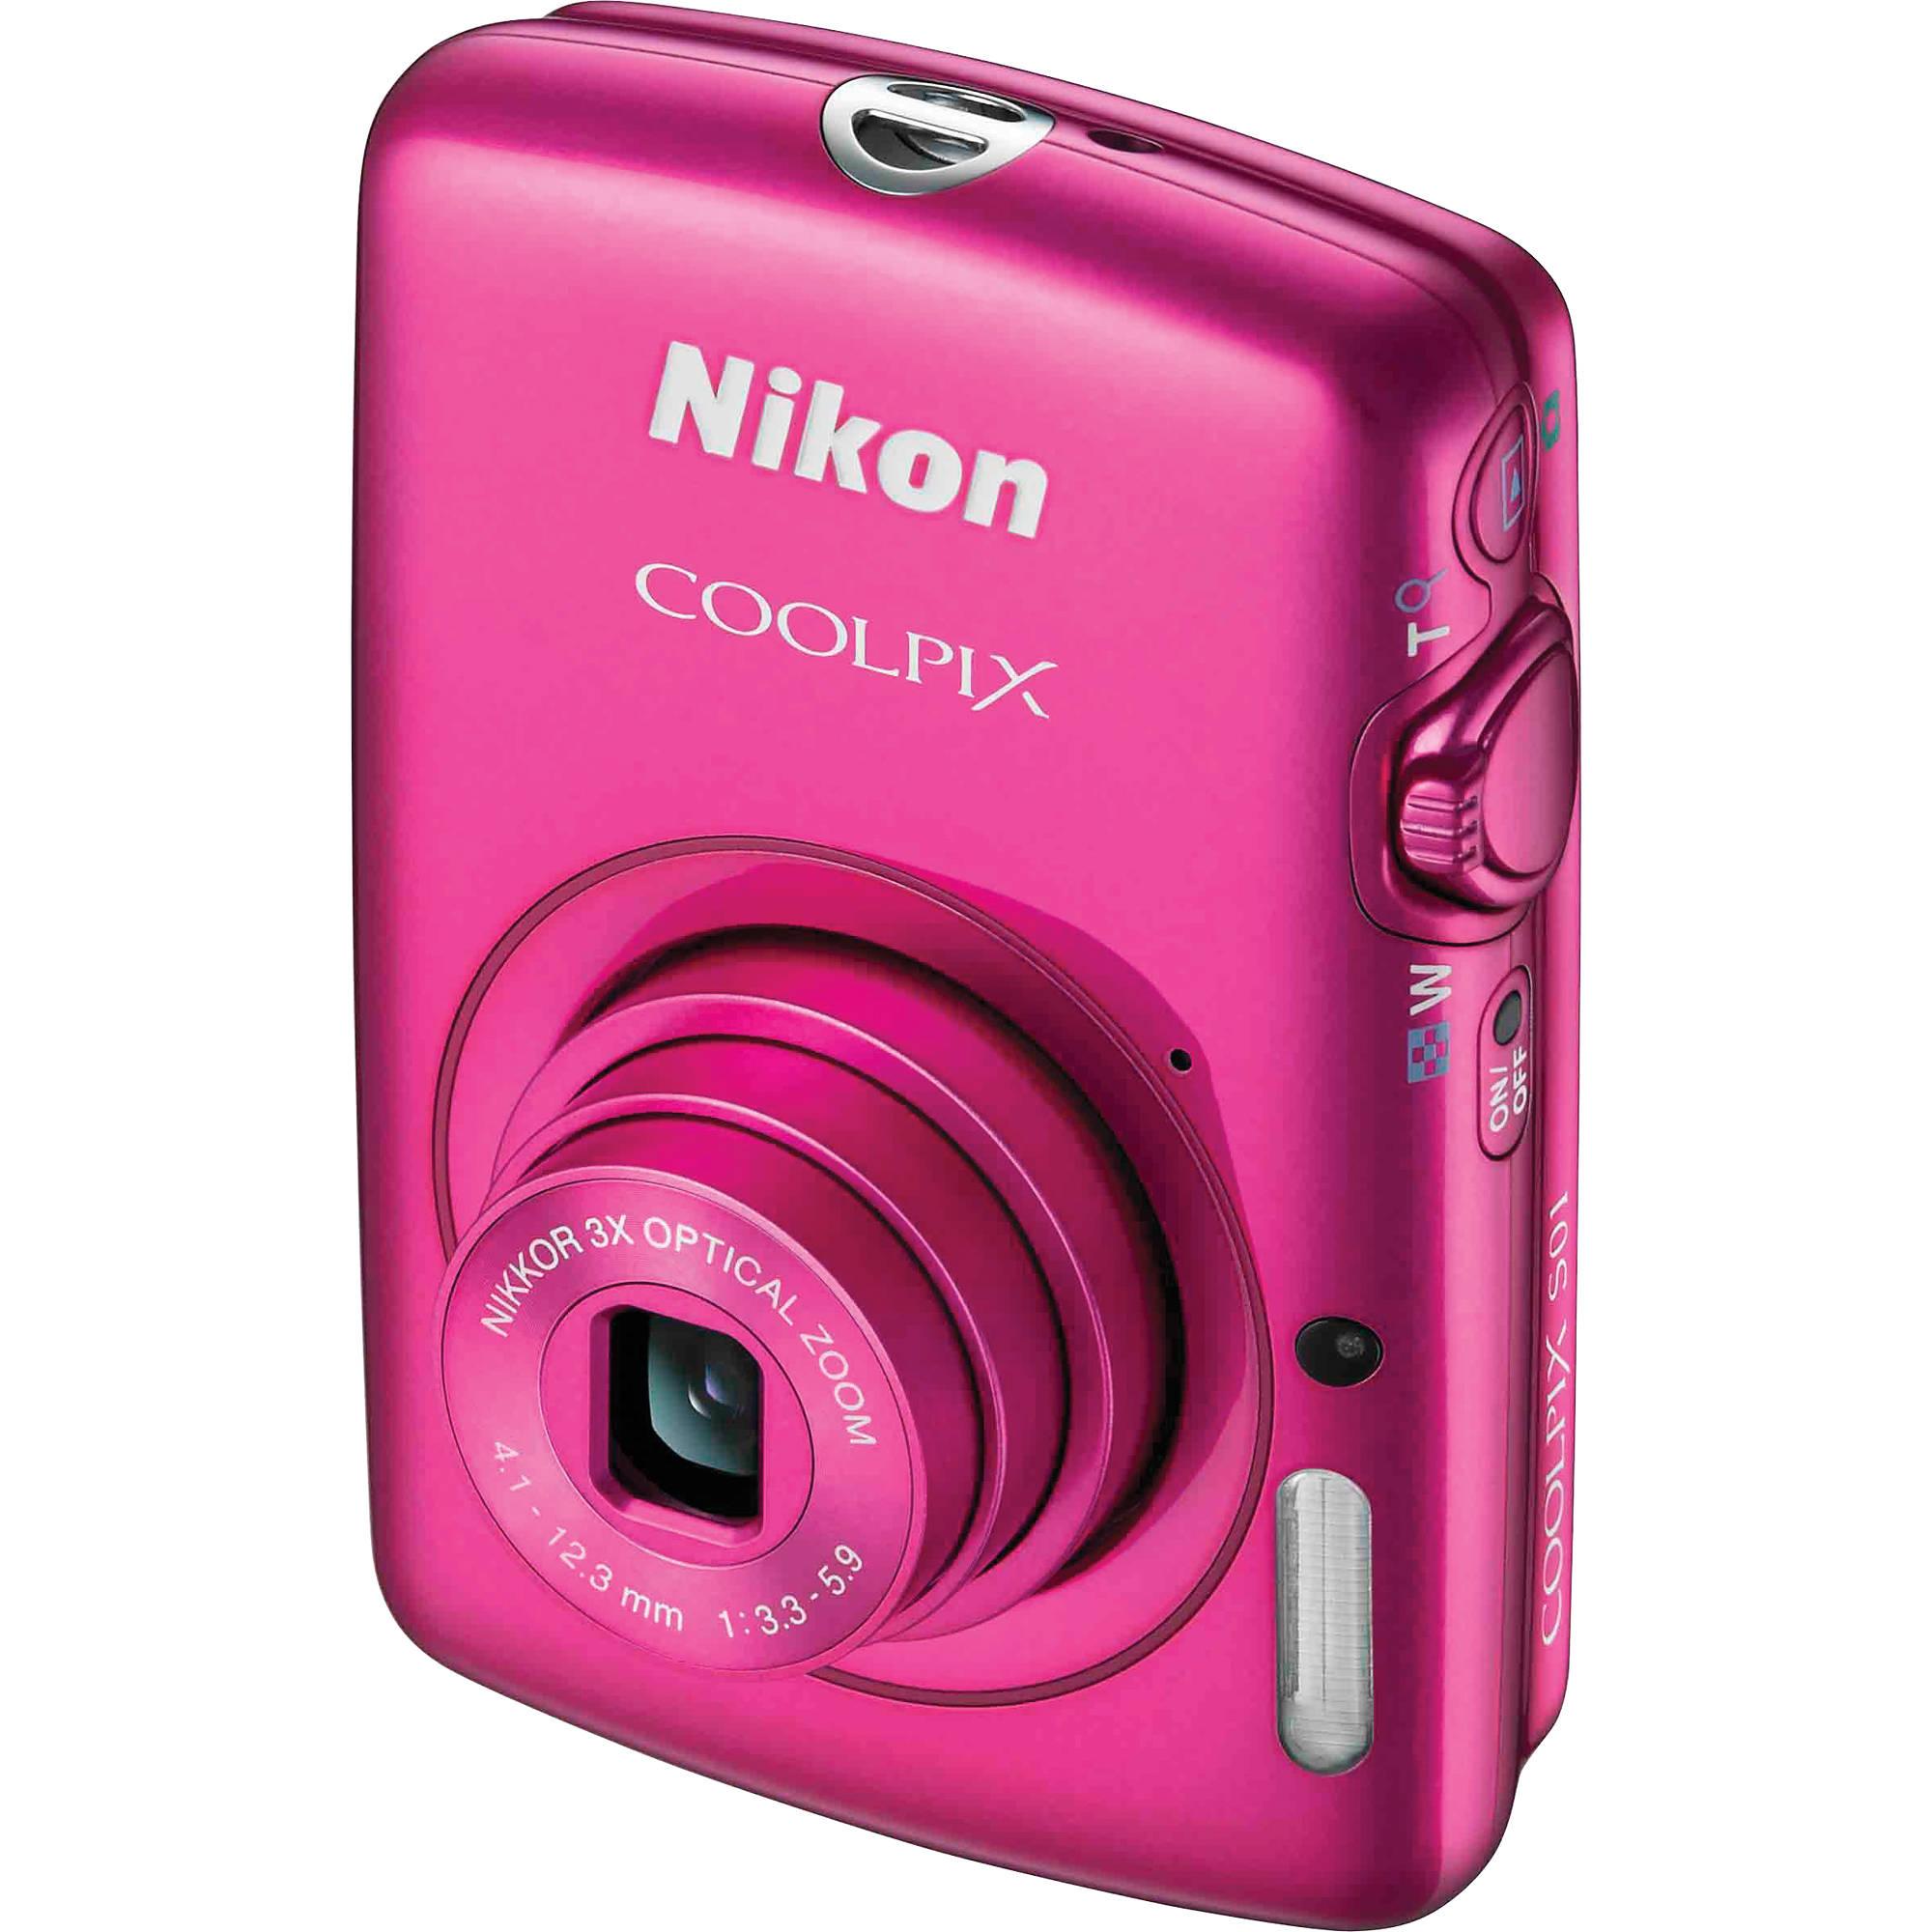 Nikon COOLPIX S01 Digital Camera (Pink) 26350 B&H Photo Video